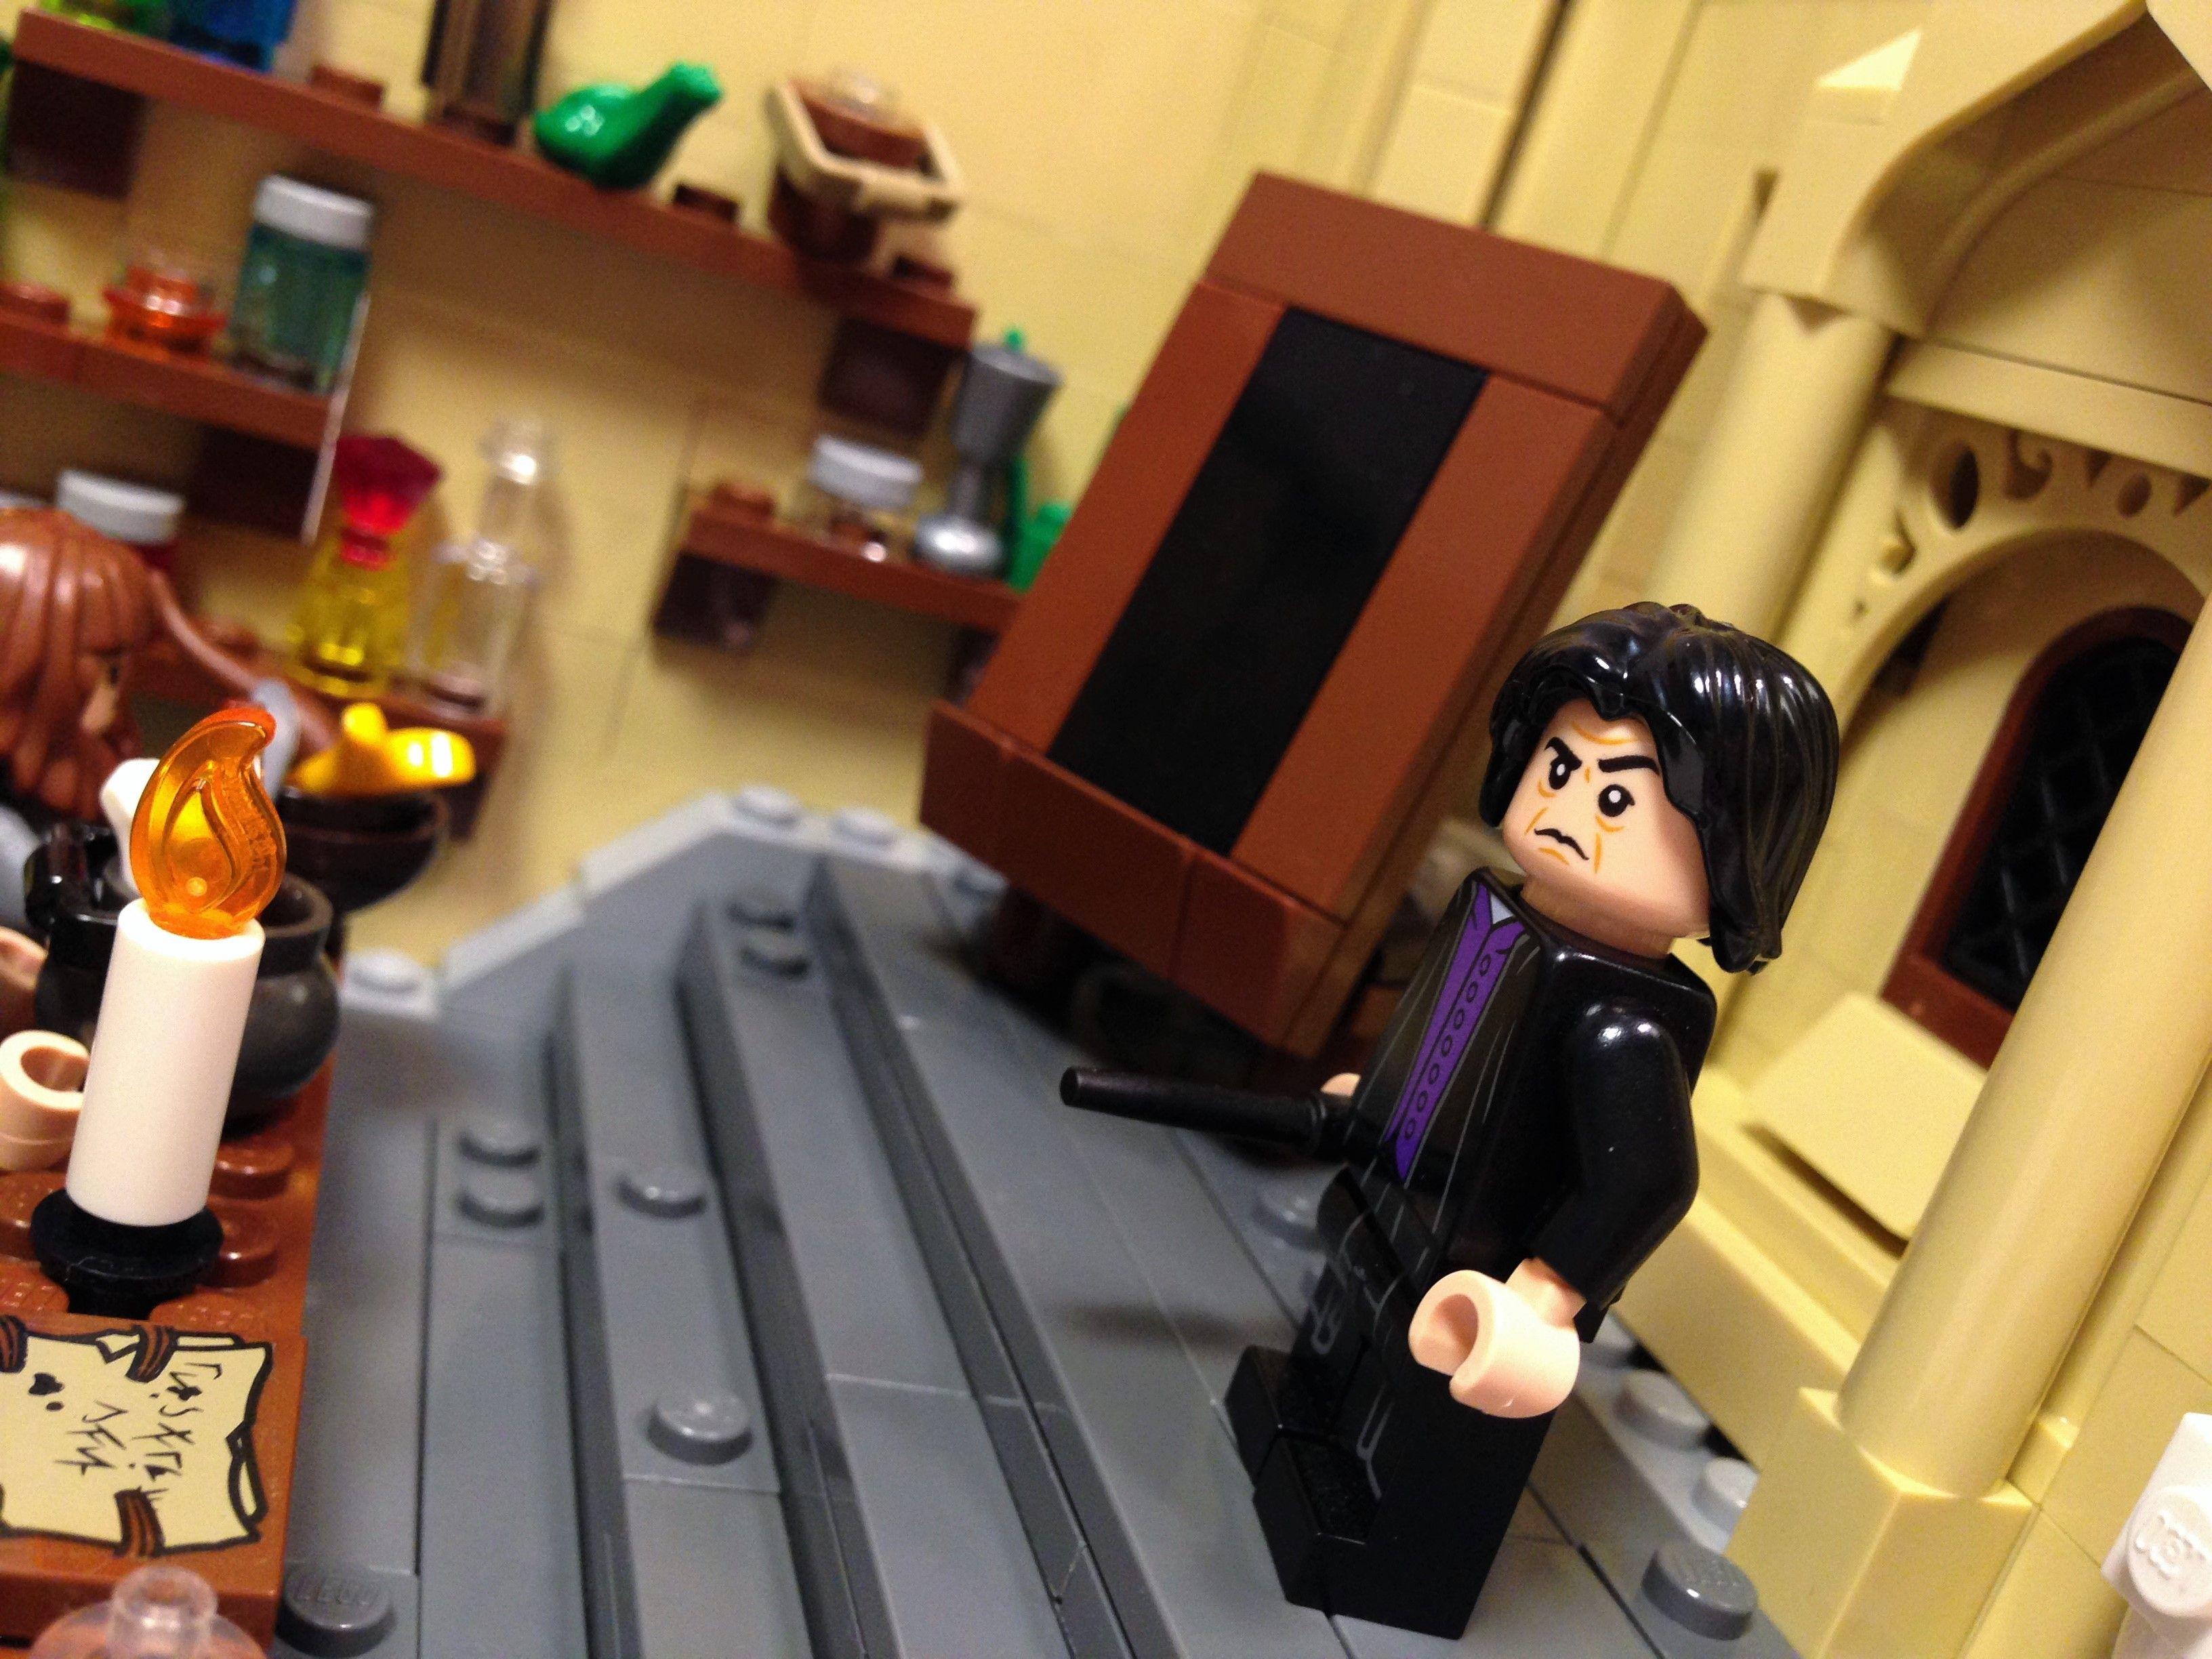 Potions Class Lego Harry Potter Moc Lego Harry Potter Moc Lego Harry Potter Lego Hogwarts